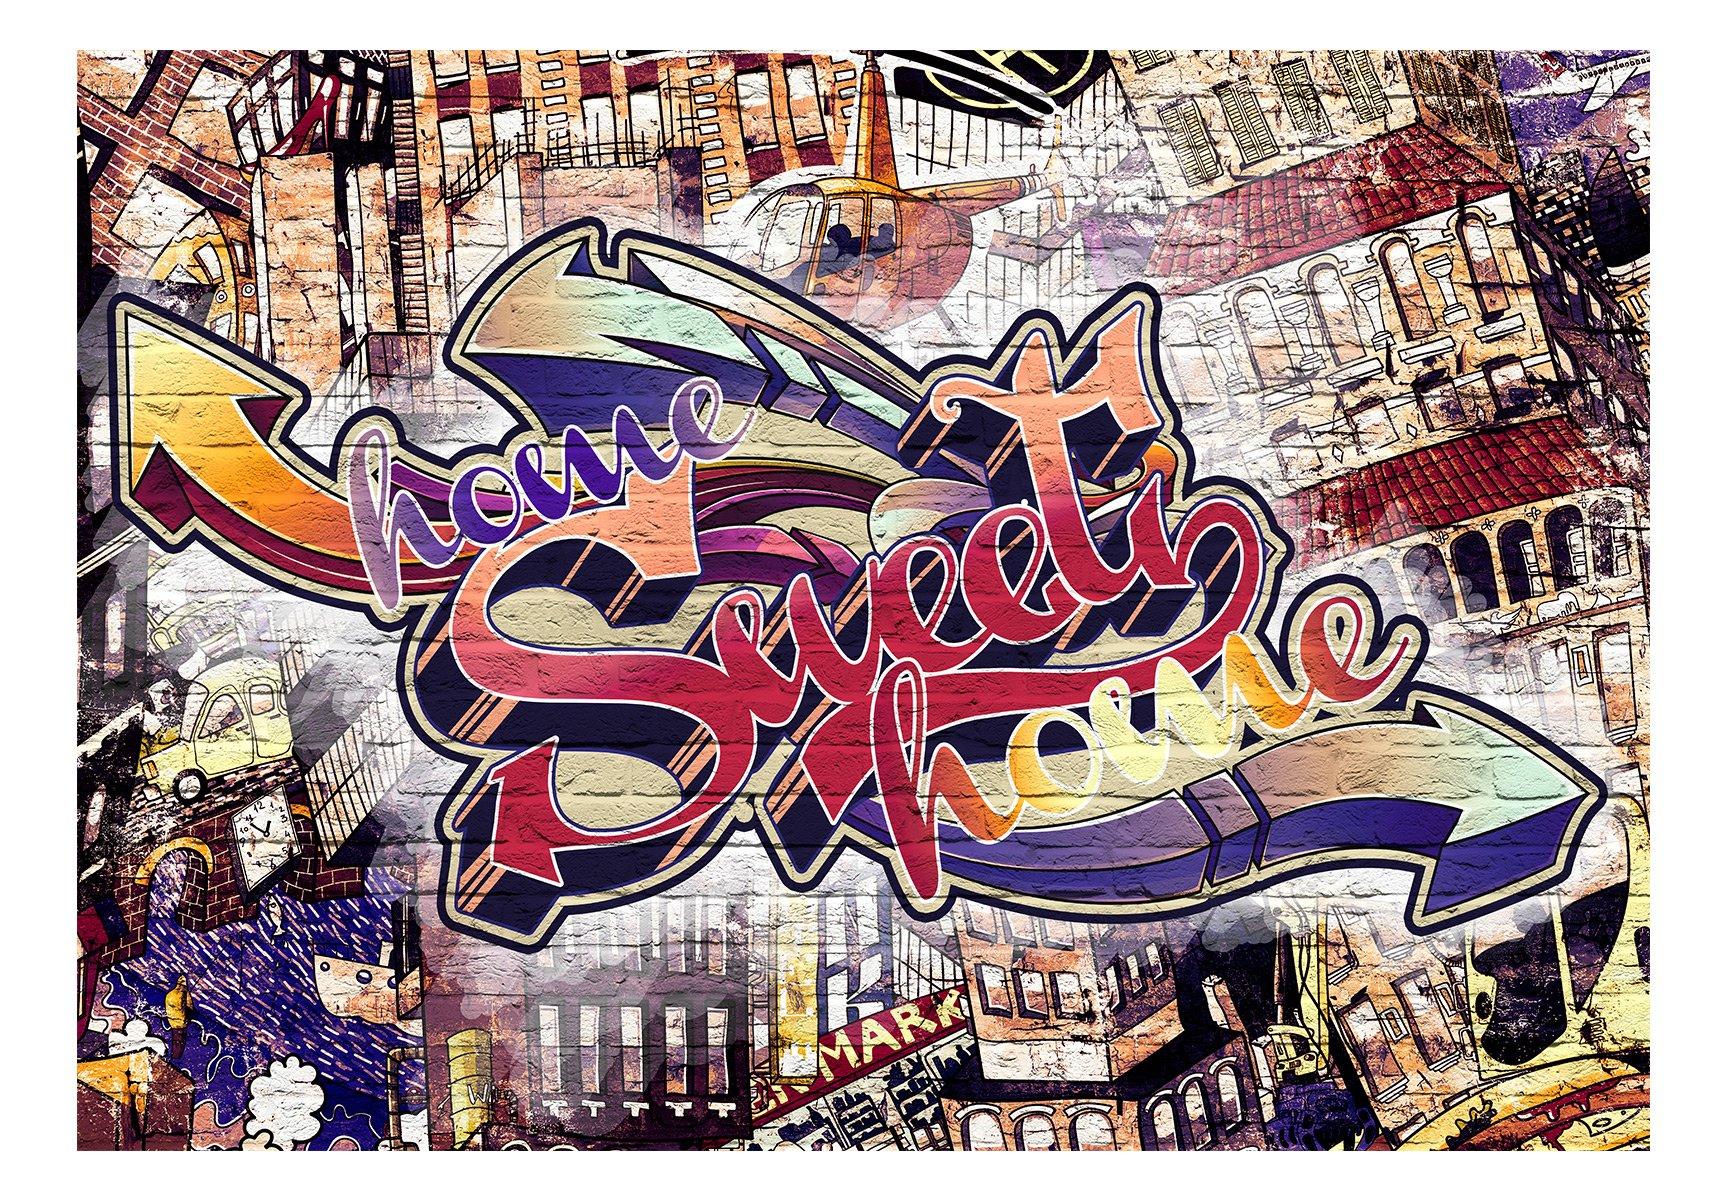 Cooles Graffiti